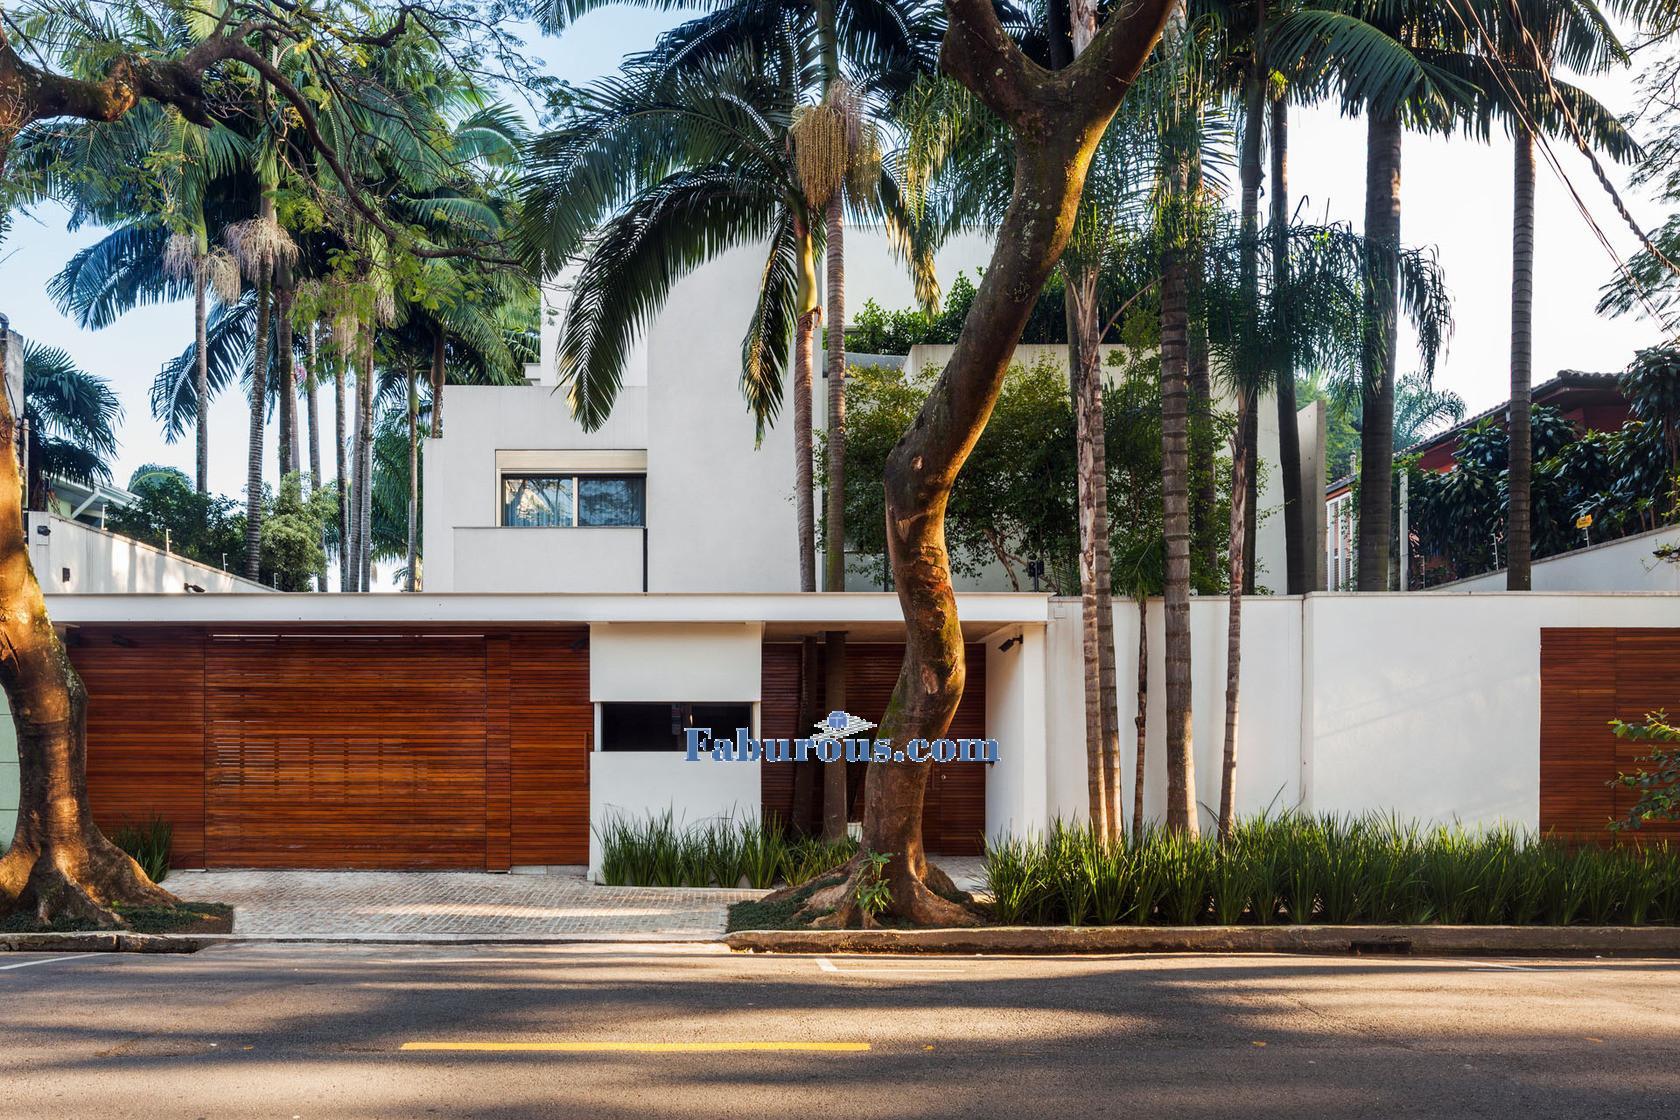 Modern Brazilian Brazilian-modern-house-design2